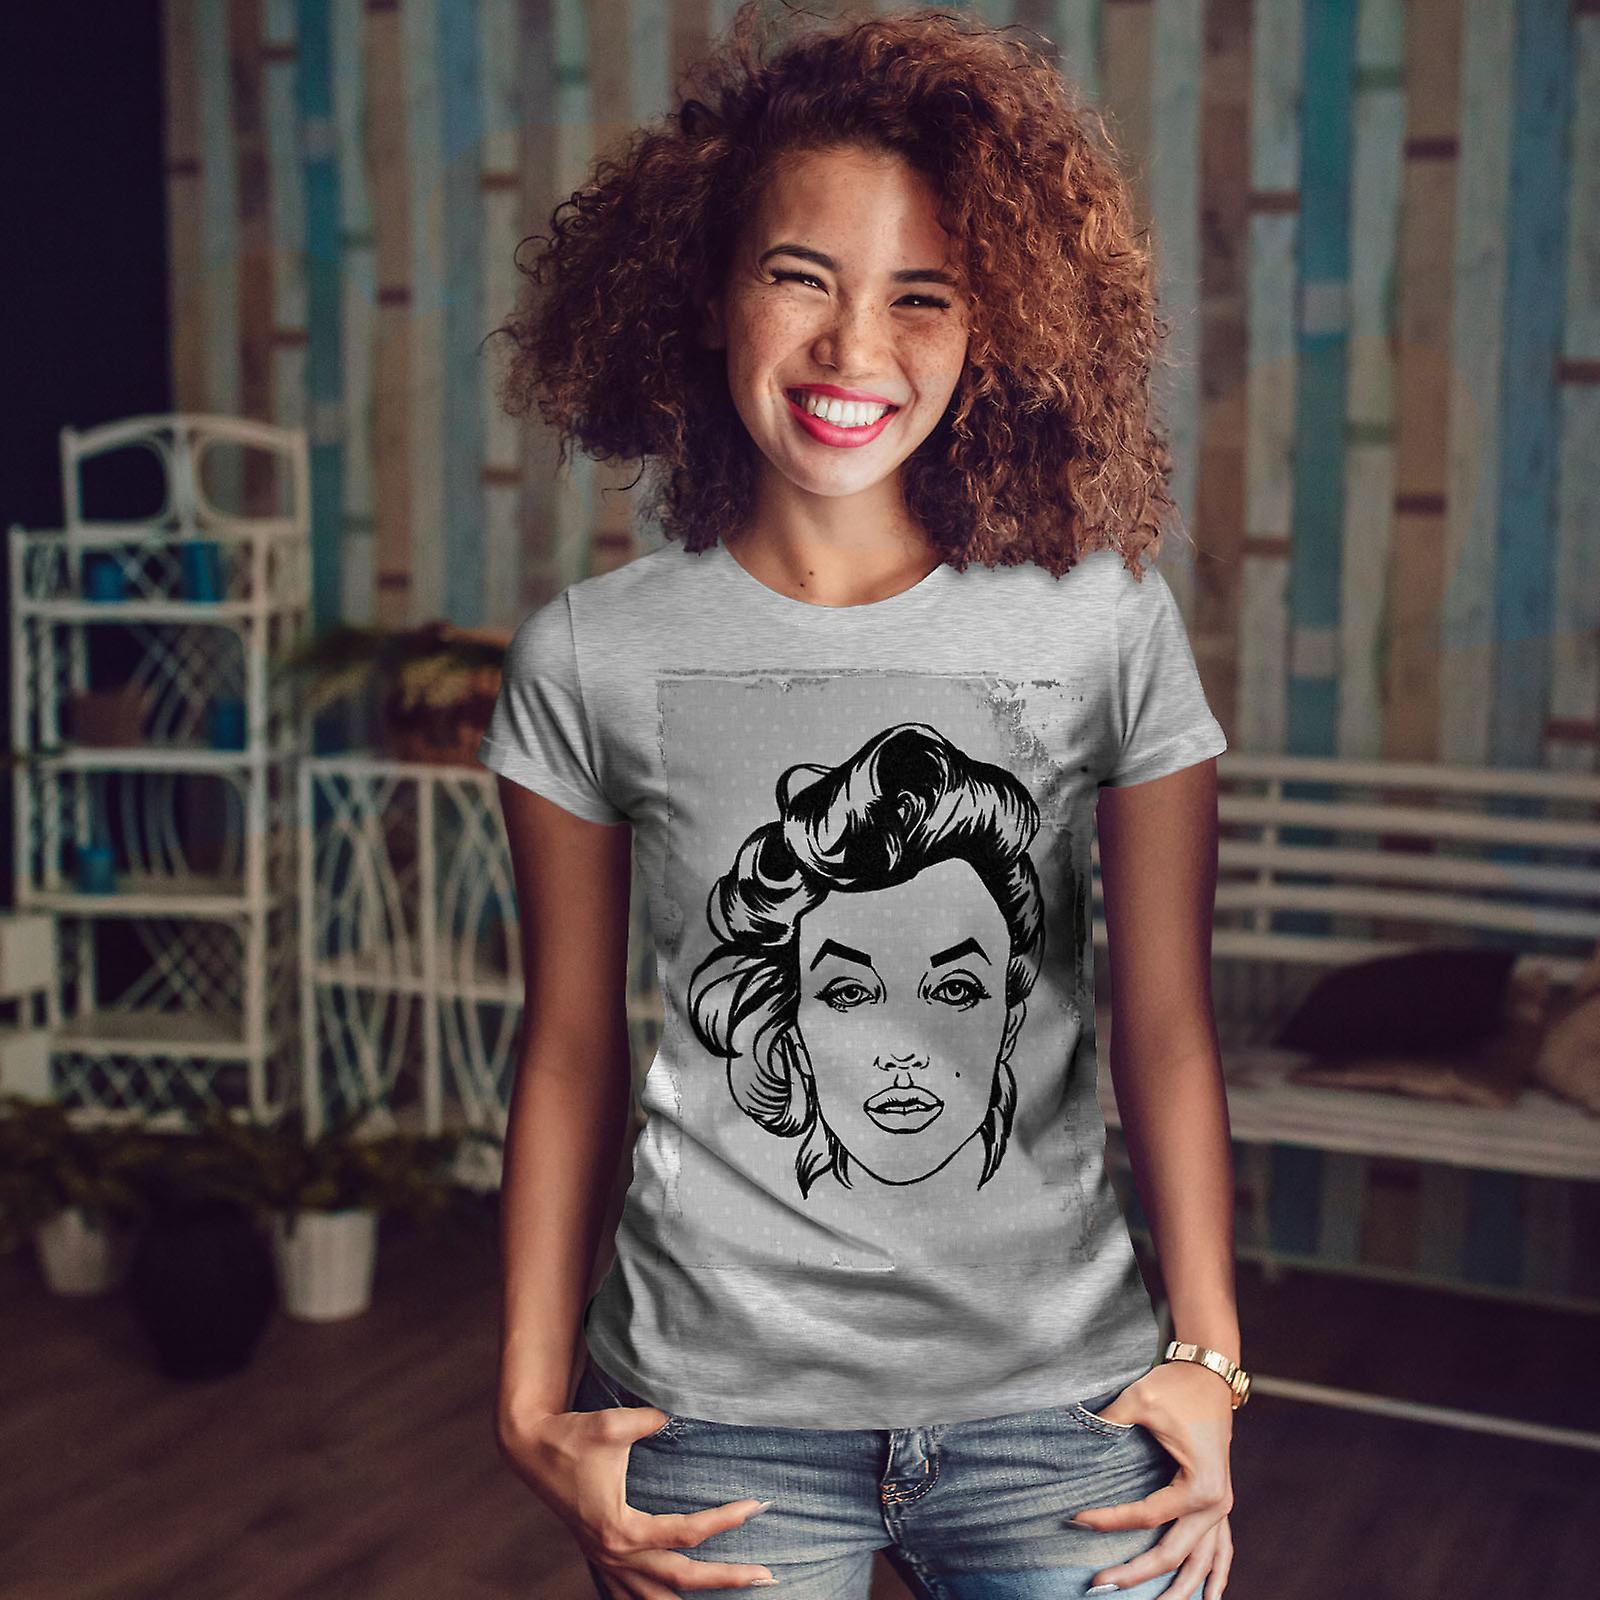 La légende célébrité Marilyn GreyT-chemise femme | Wellcoda